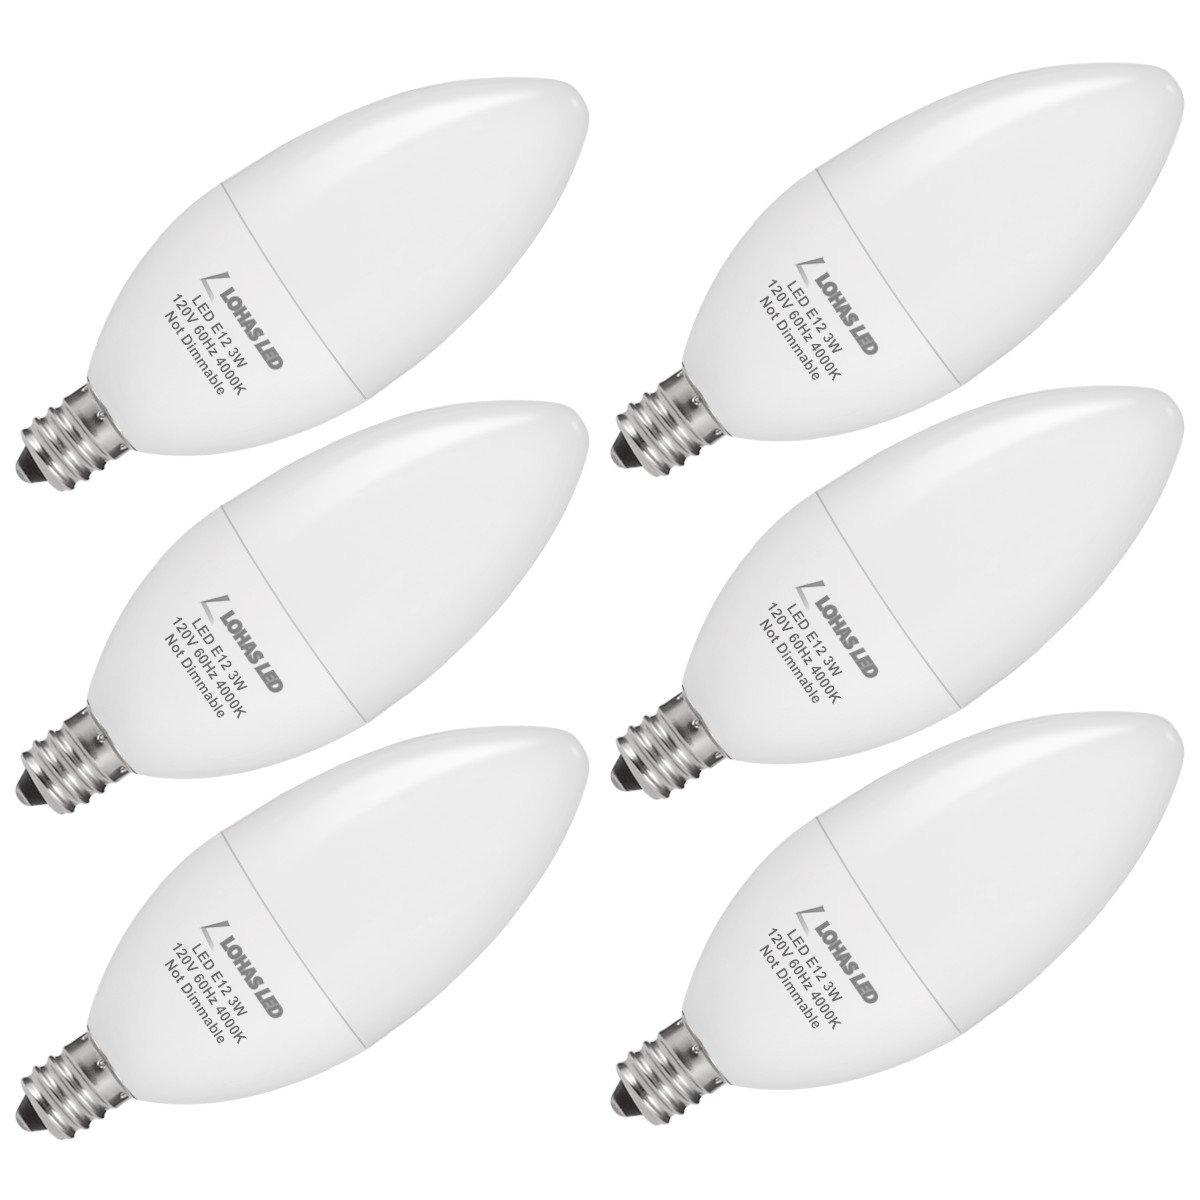 LOHAS 3W LED Light, 25W Halogen Bulb Replacement, E12 Candelabra Base, Natural Daylight 4000K LED Bulbs for Kitchen(6 Pack)